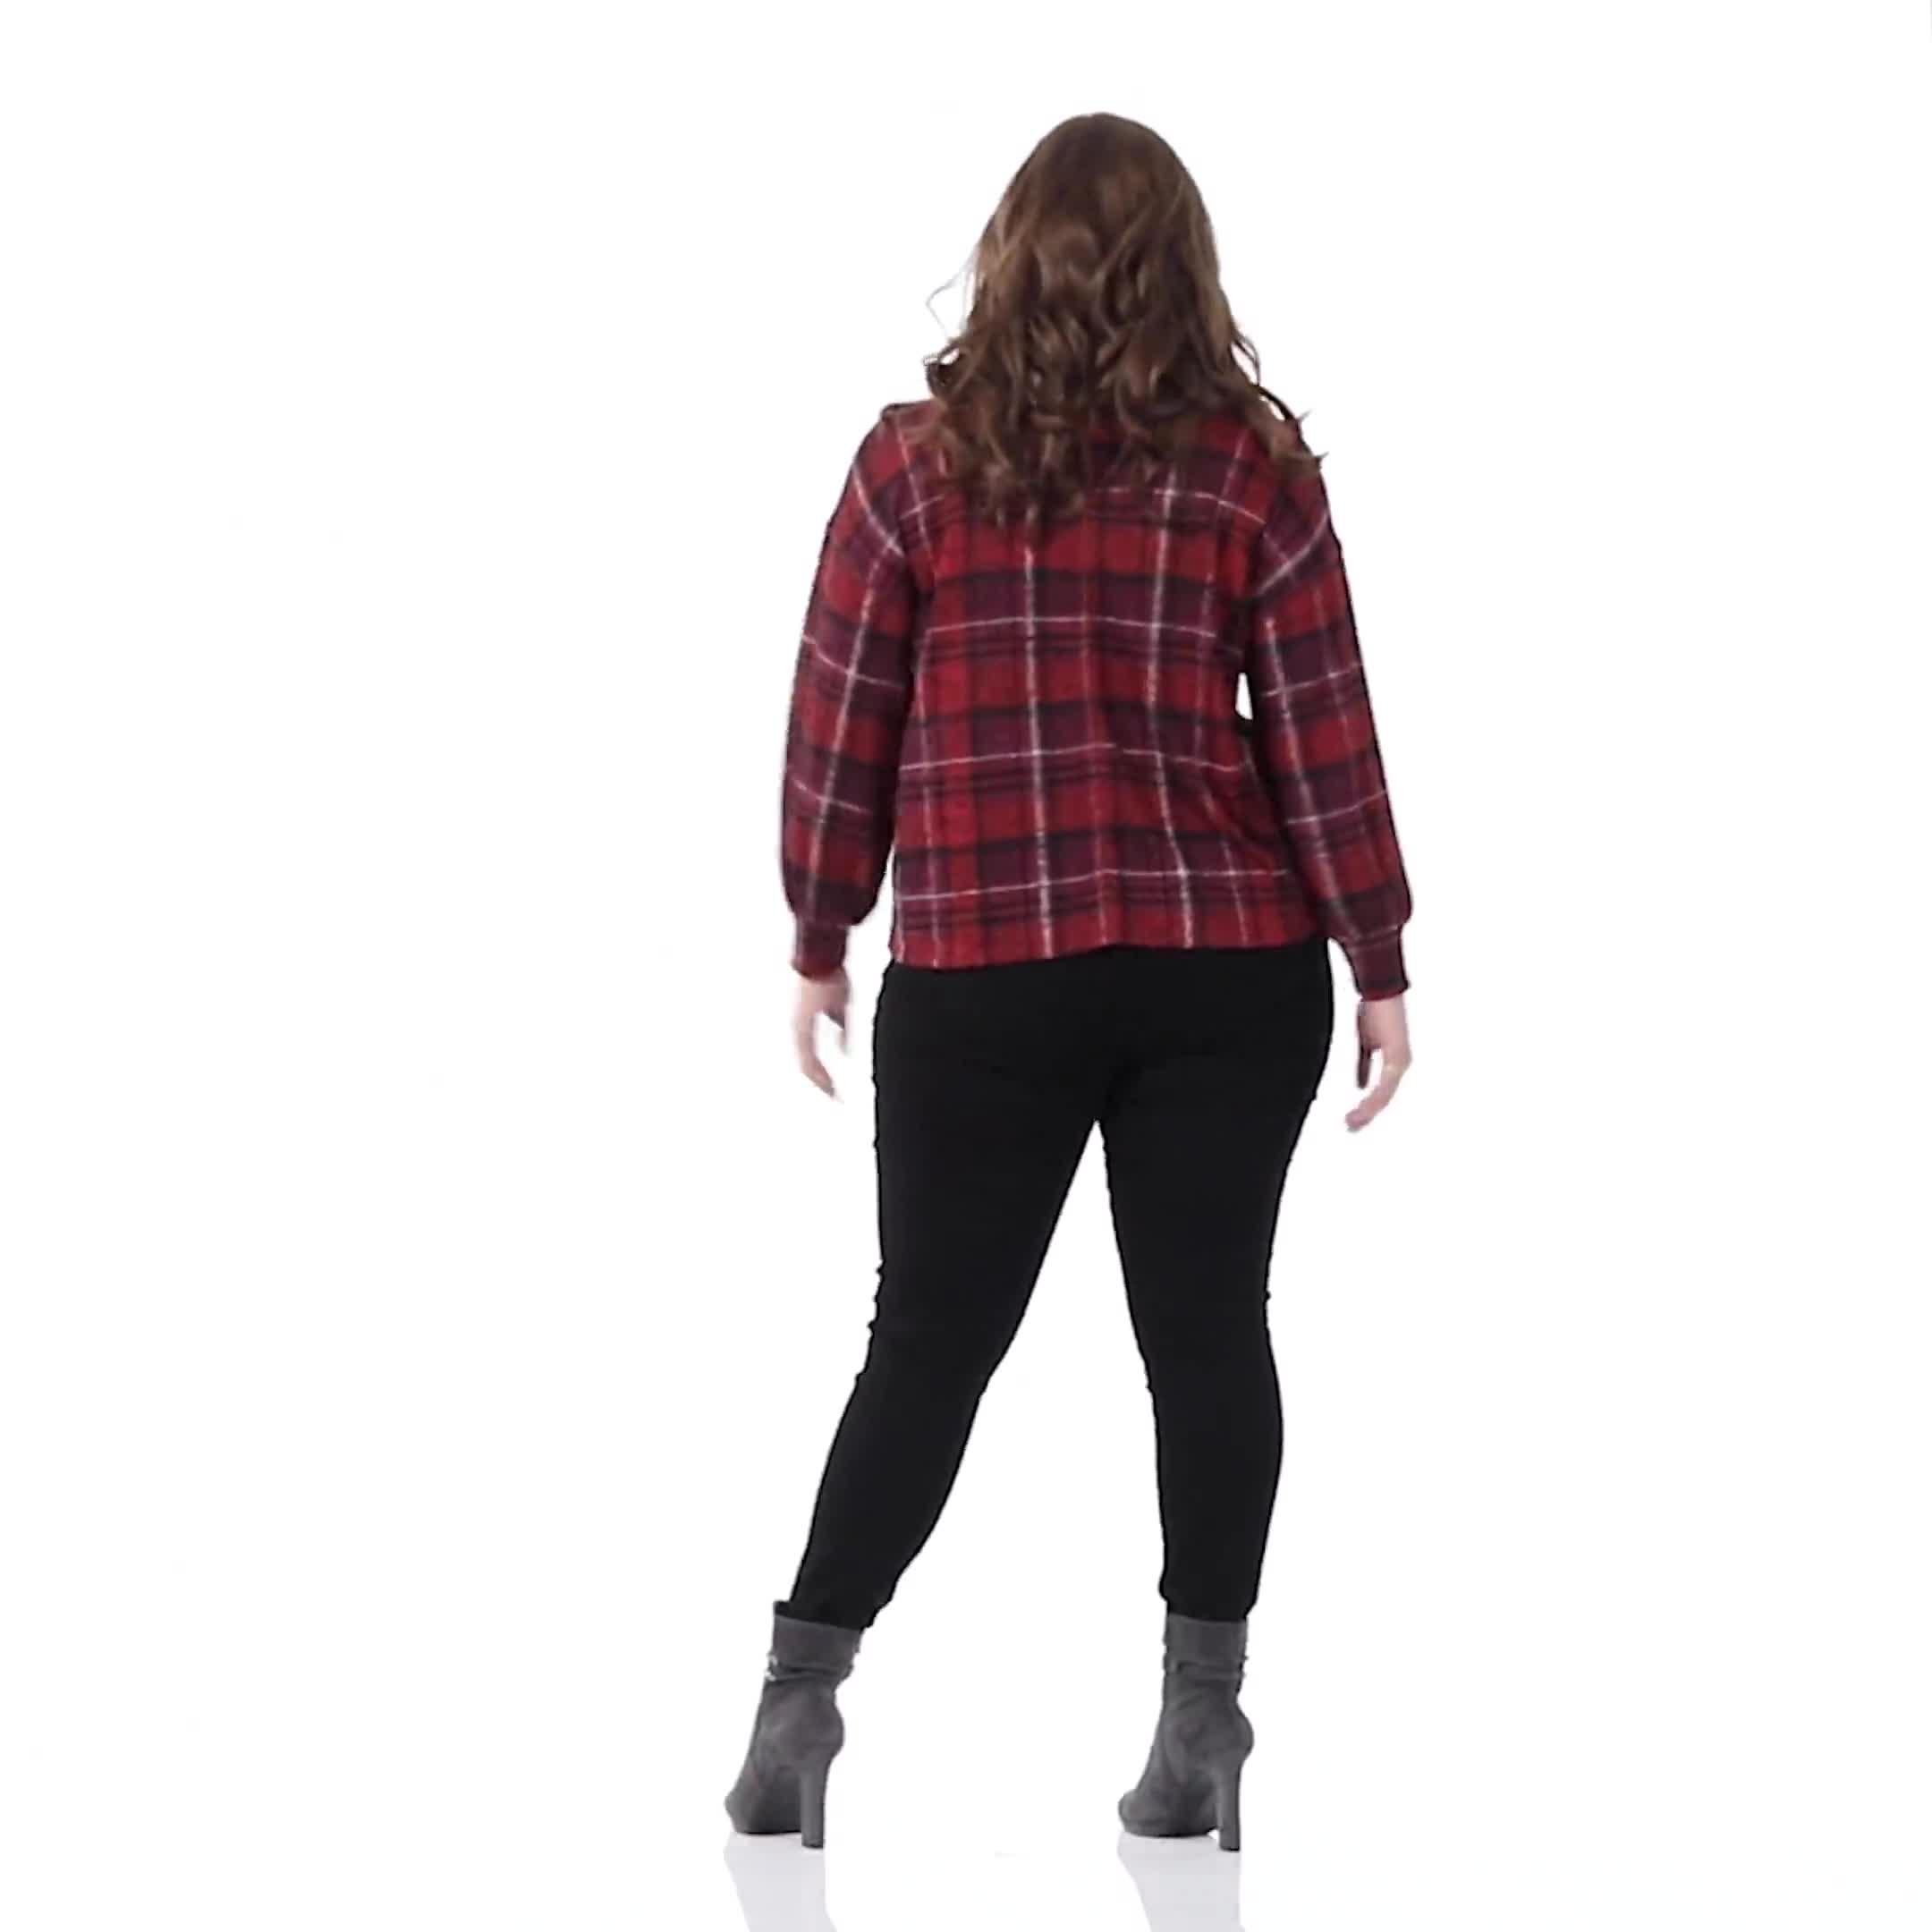 Red Plaid Cowl Neck Top - Plus - Video